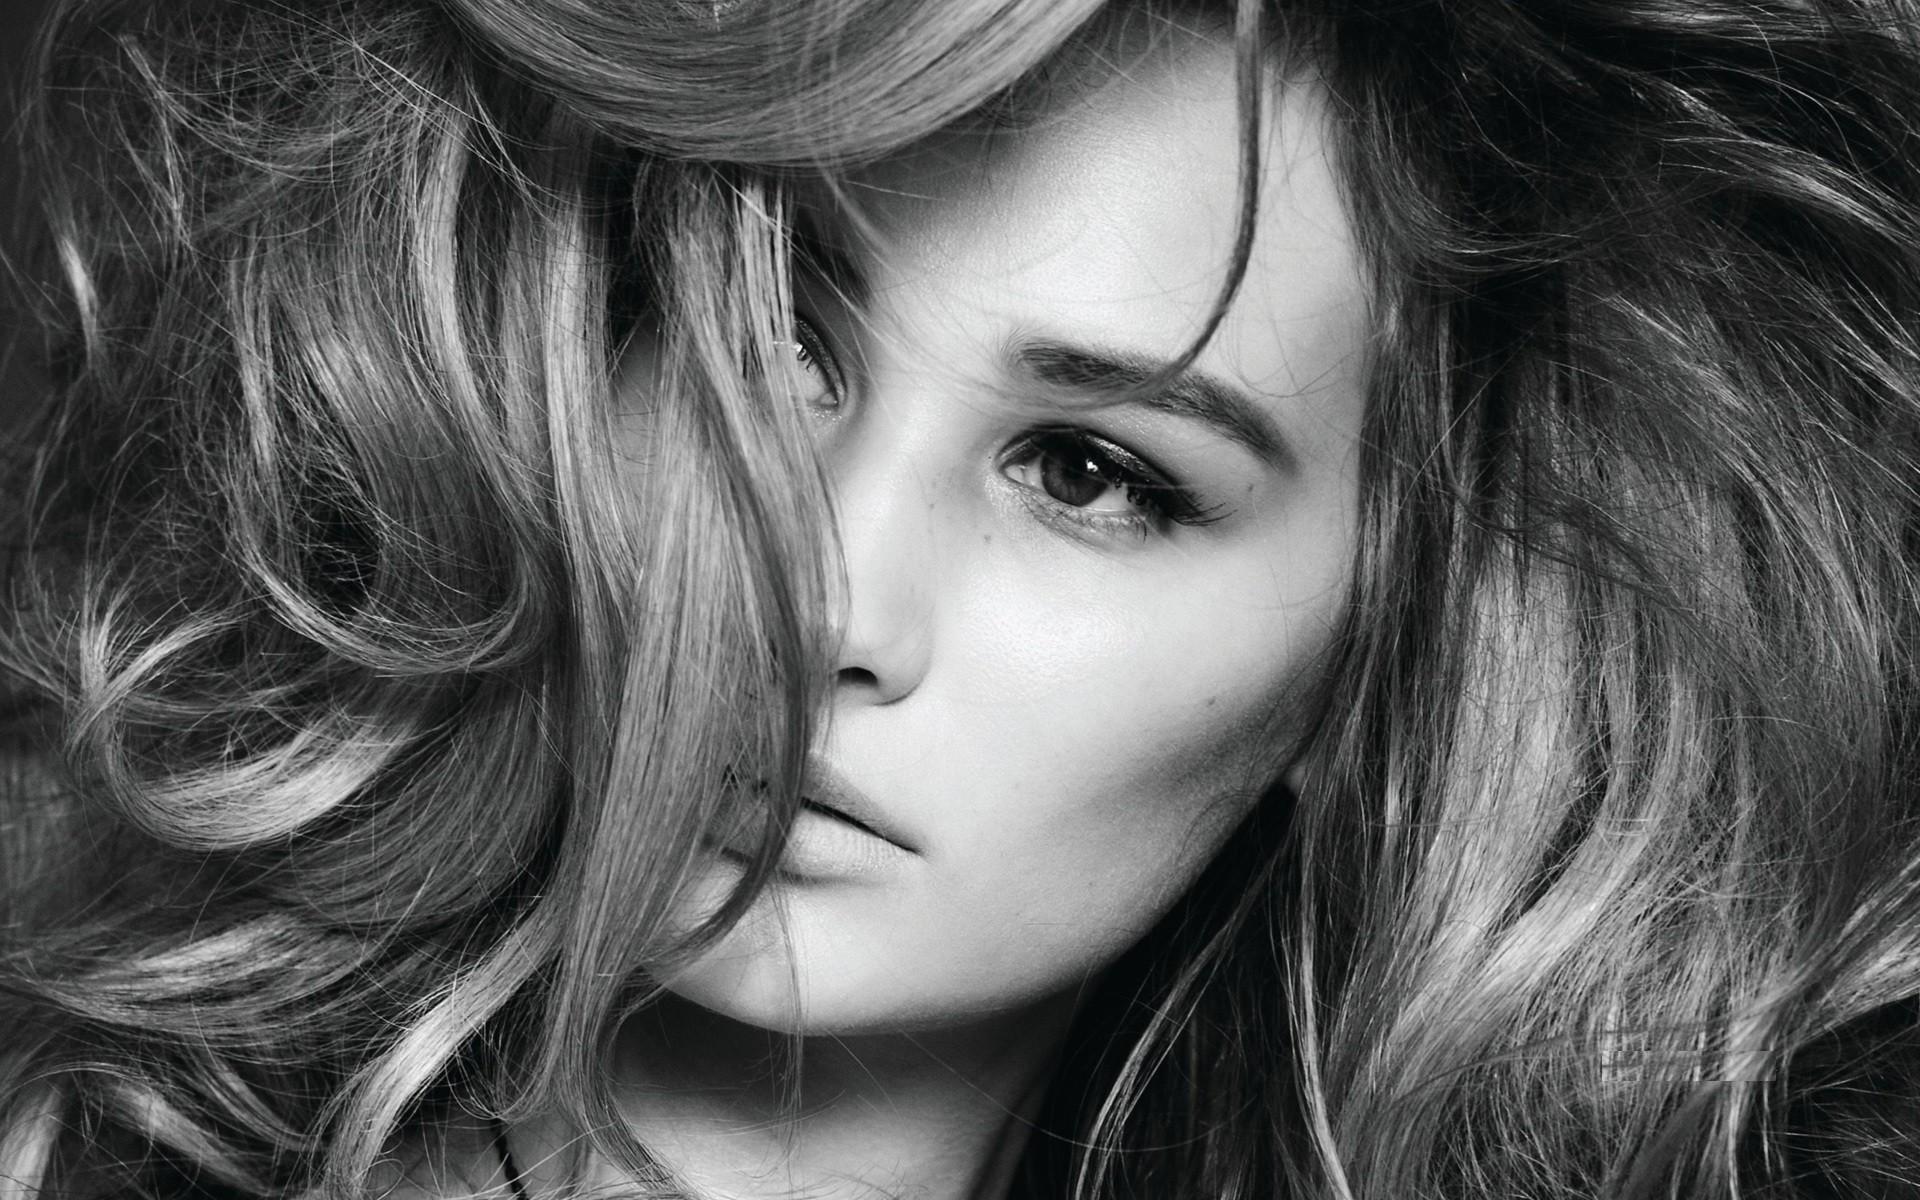 beauty-girls-black-white-wallpaper-images-photos-euob1q5o